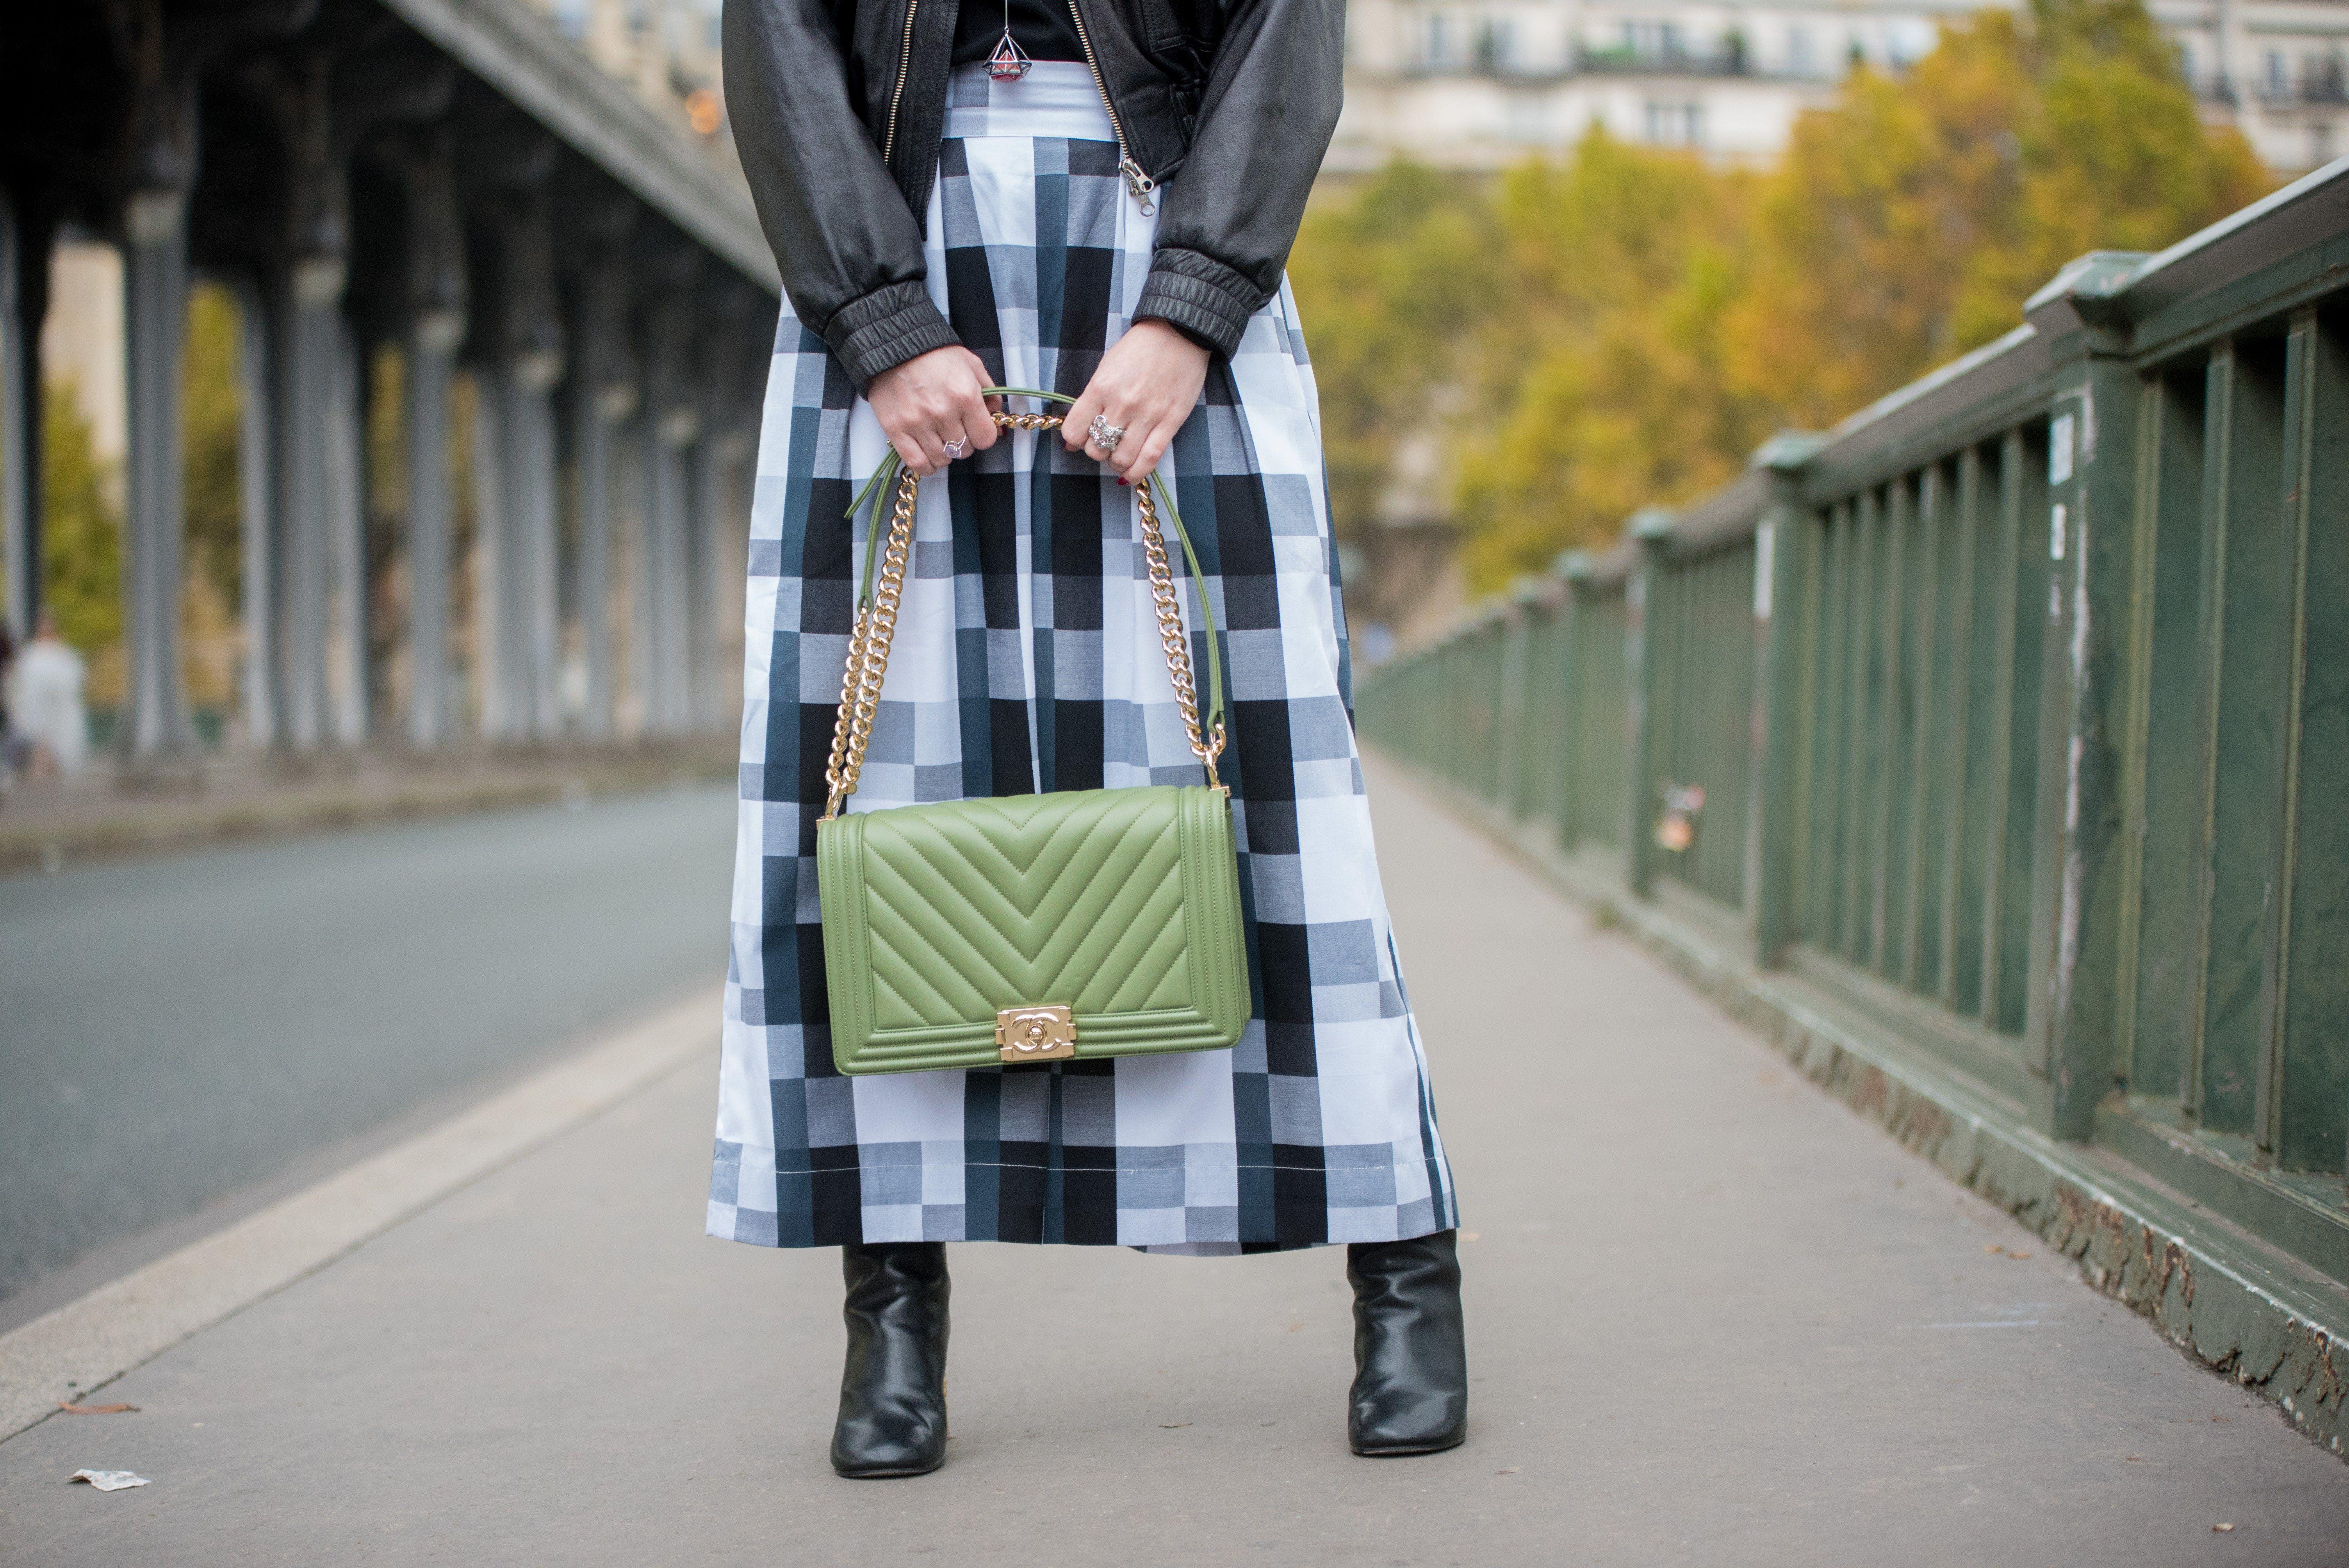 Fashion details. #pantacourt #bota #boots #bolsa #bag #chanel #boybag #xadrez #moda #fashion #style #estilo #outfit